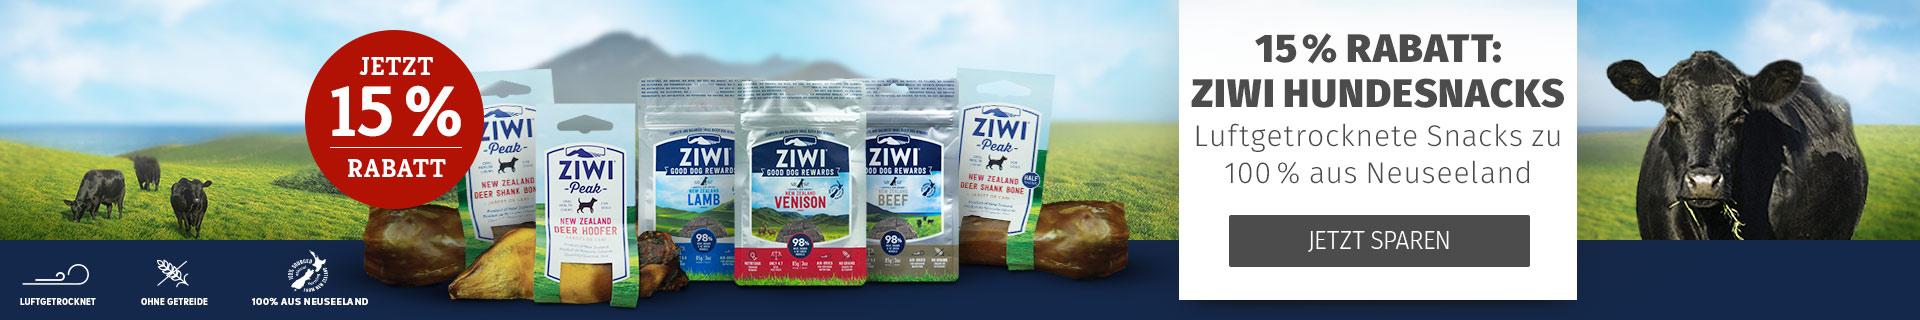 15% Rabatt auf Ziwi Hundesnacks